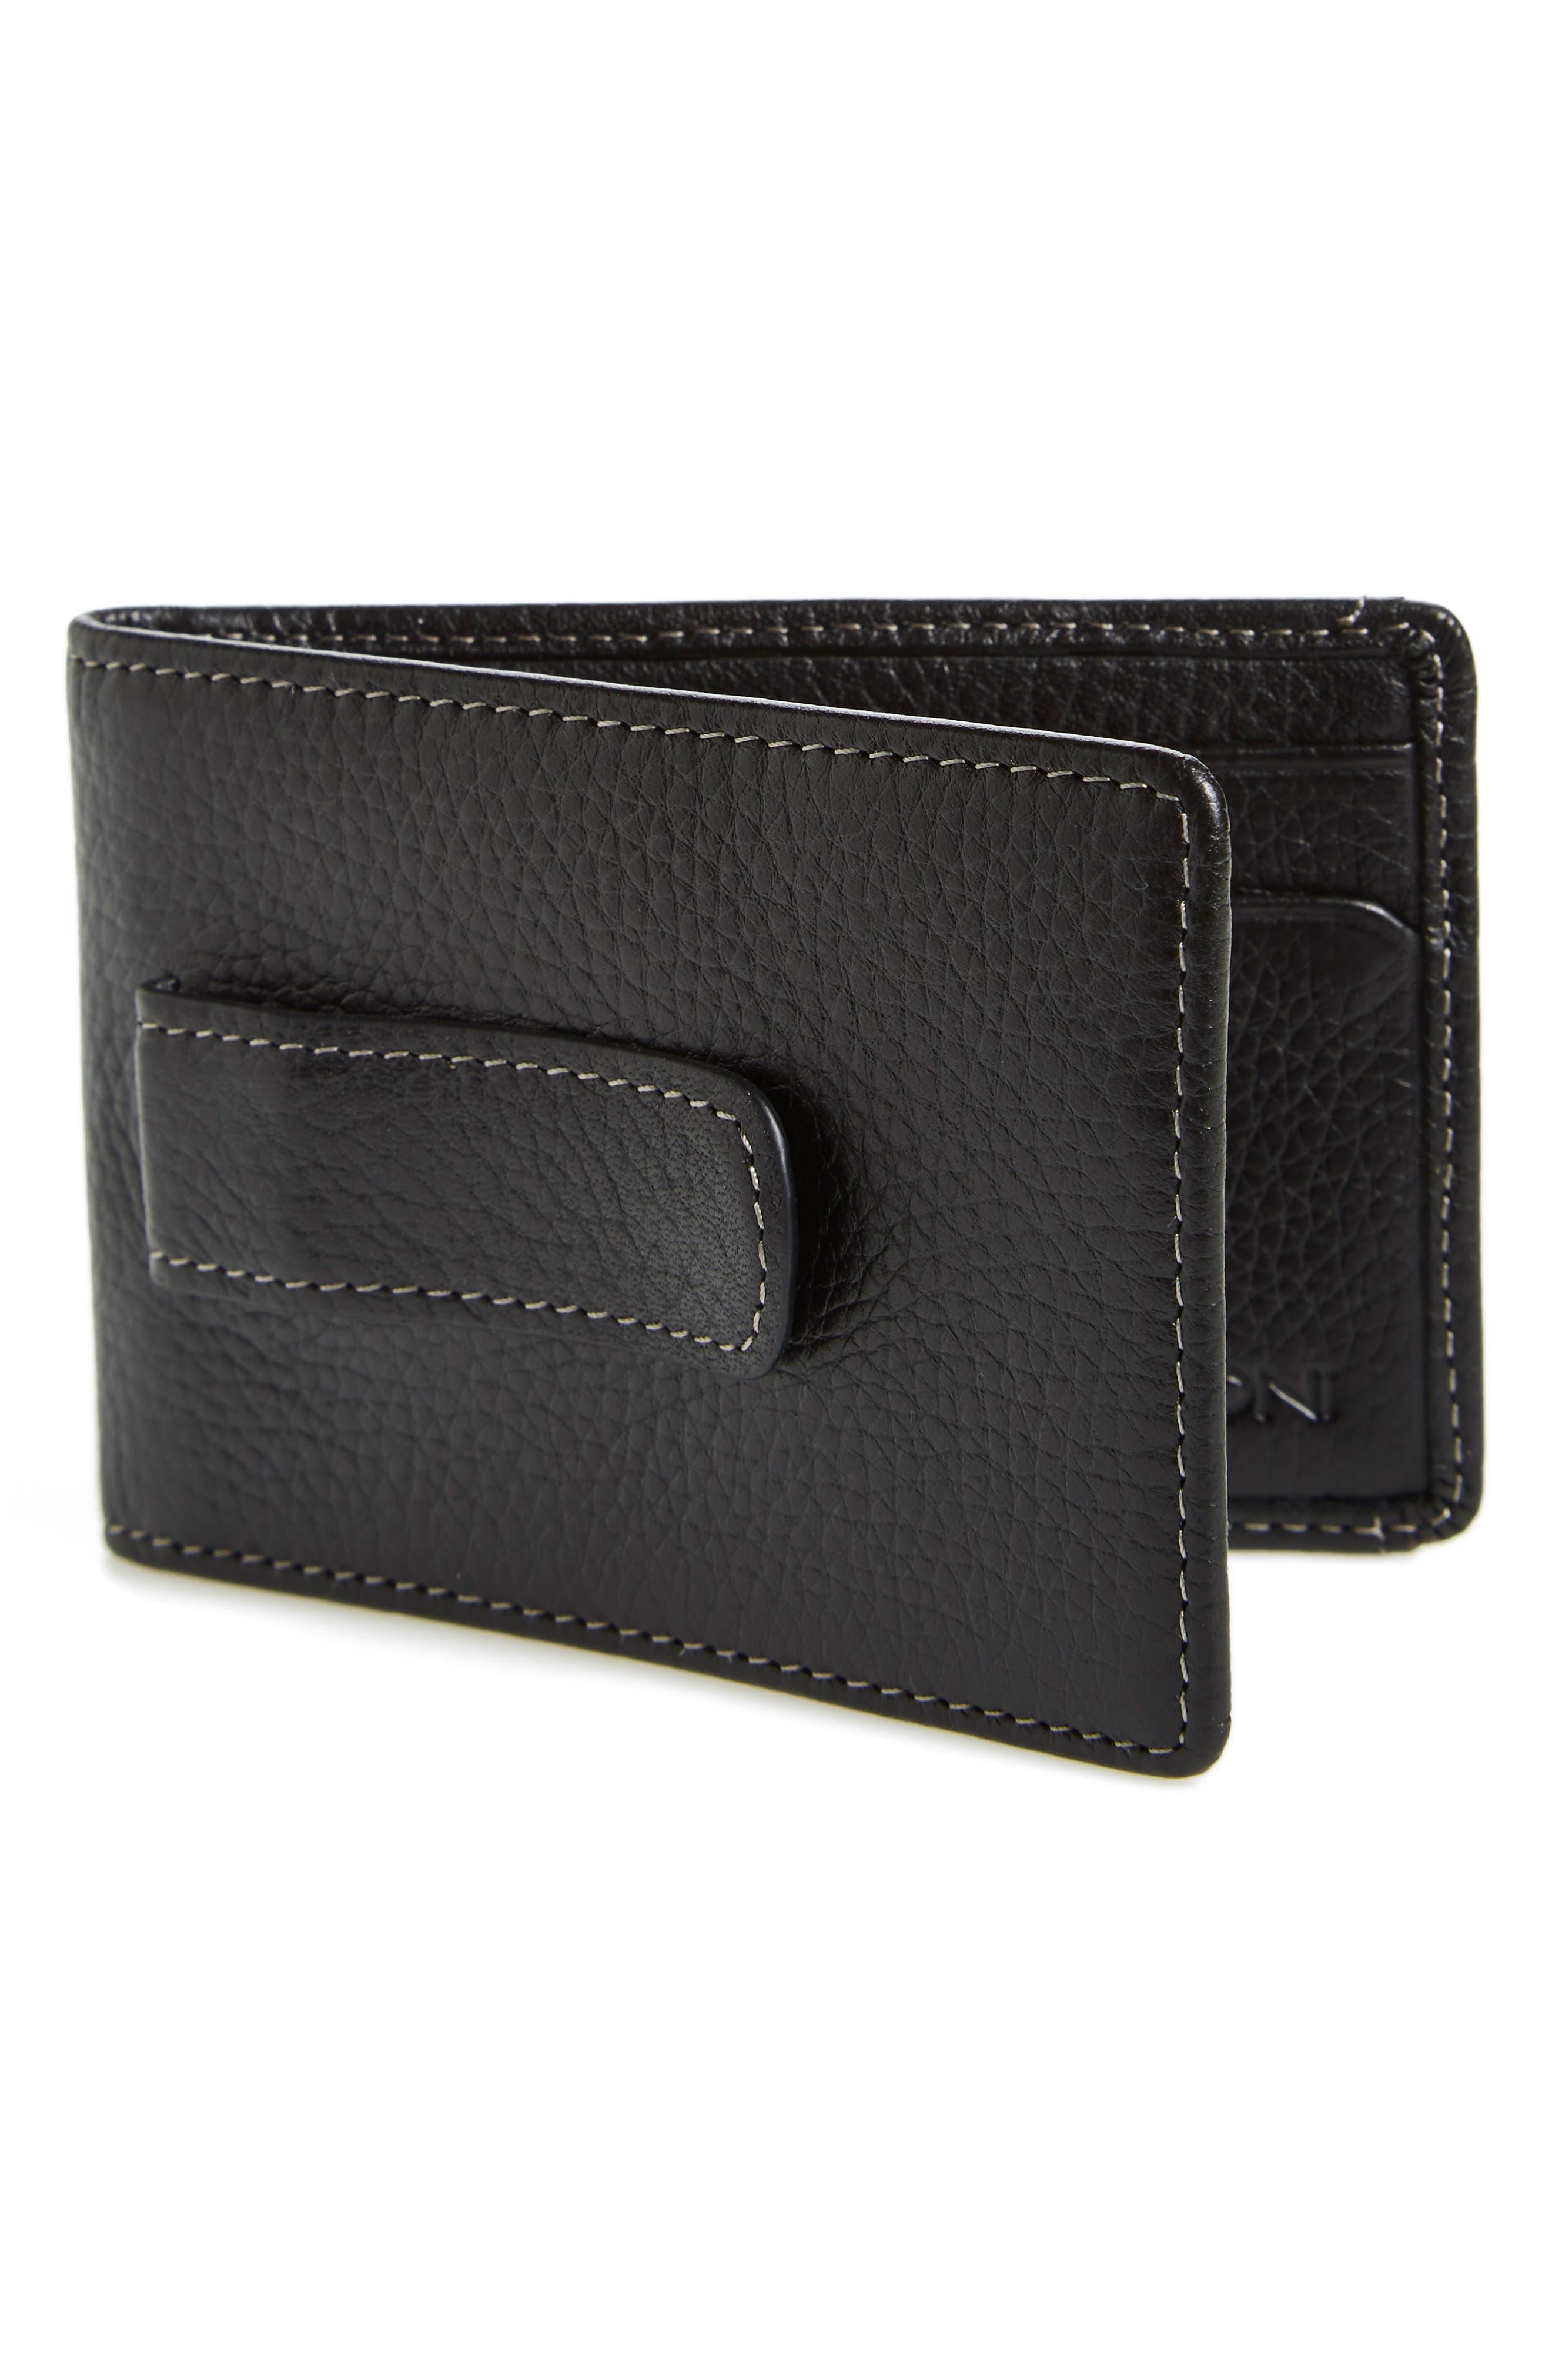 'Tyler' Money Clip Wallet,                             Alternate thumbnail 4, color,                             001